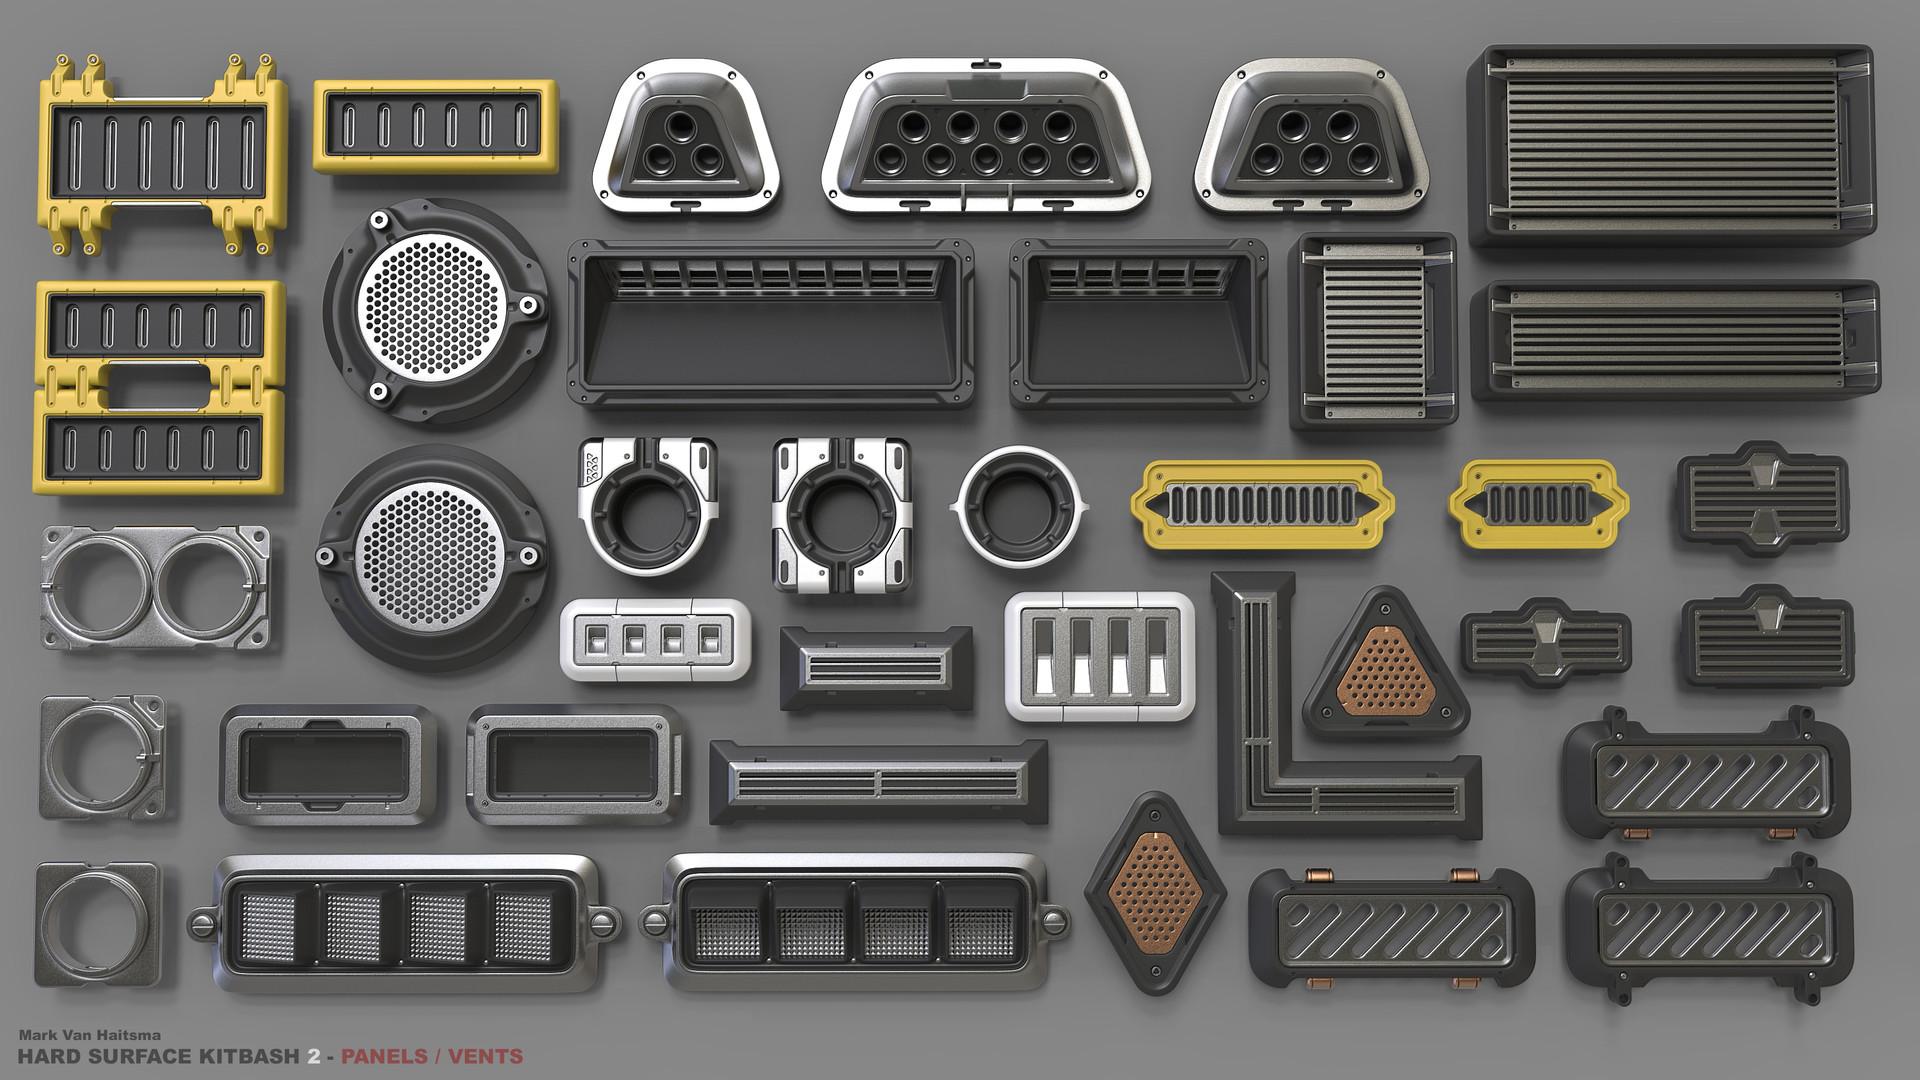 ArtStation - Hard Surface Kitbash Library 2 - Panels/Vents/Hinges